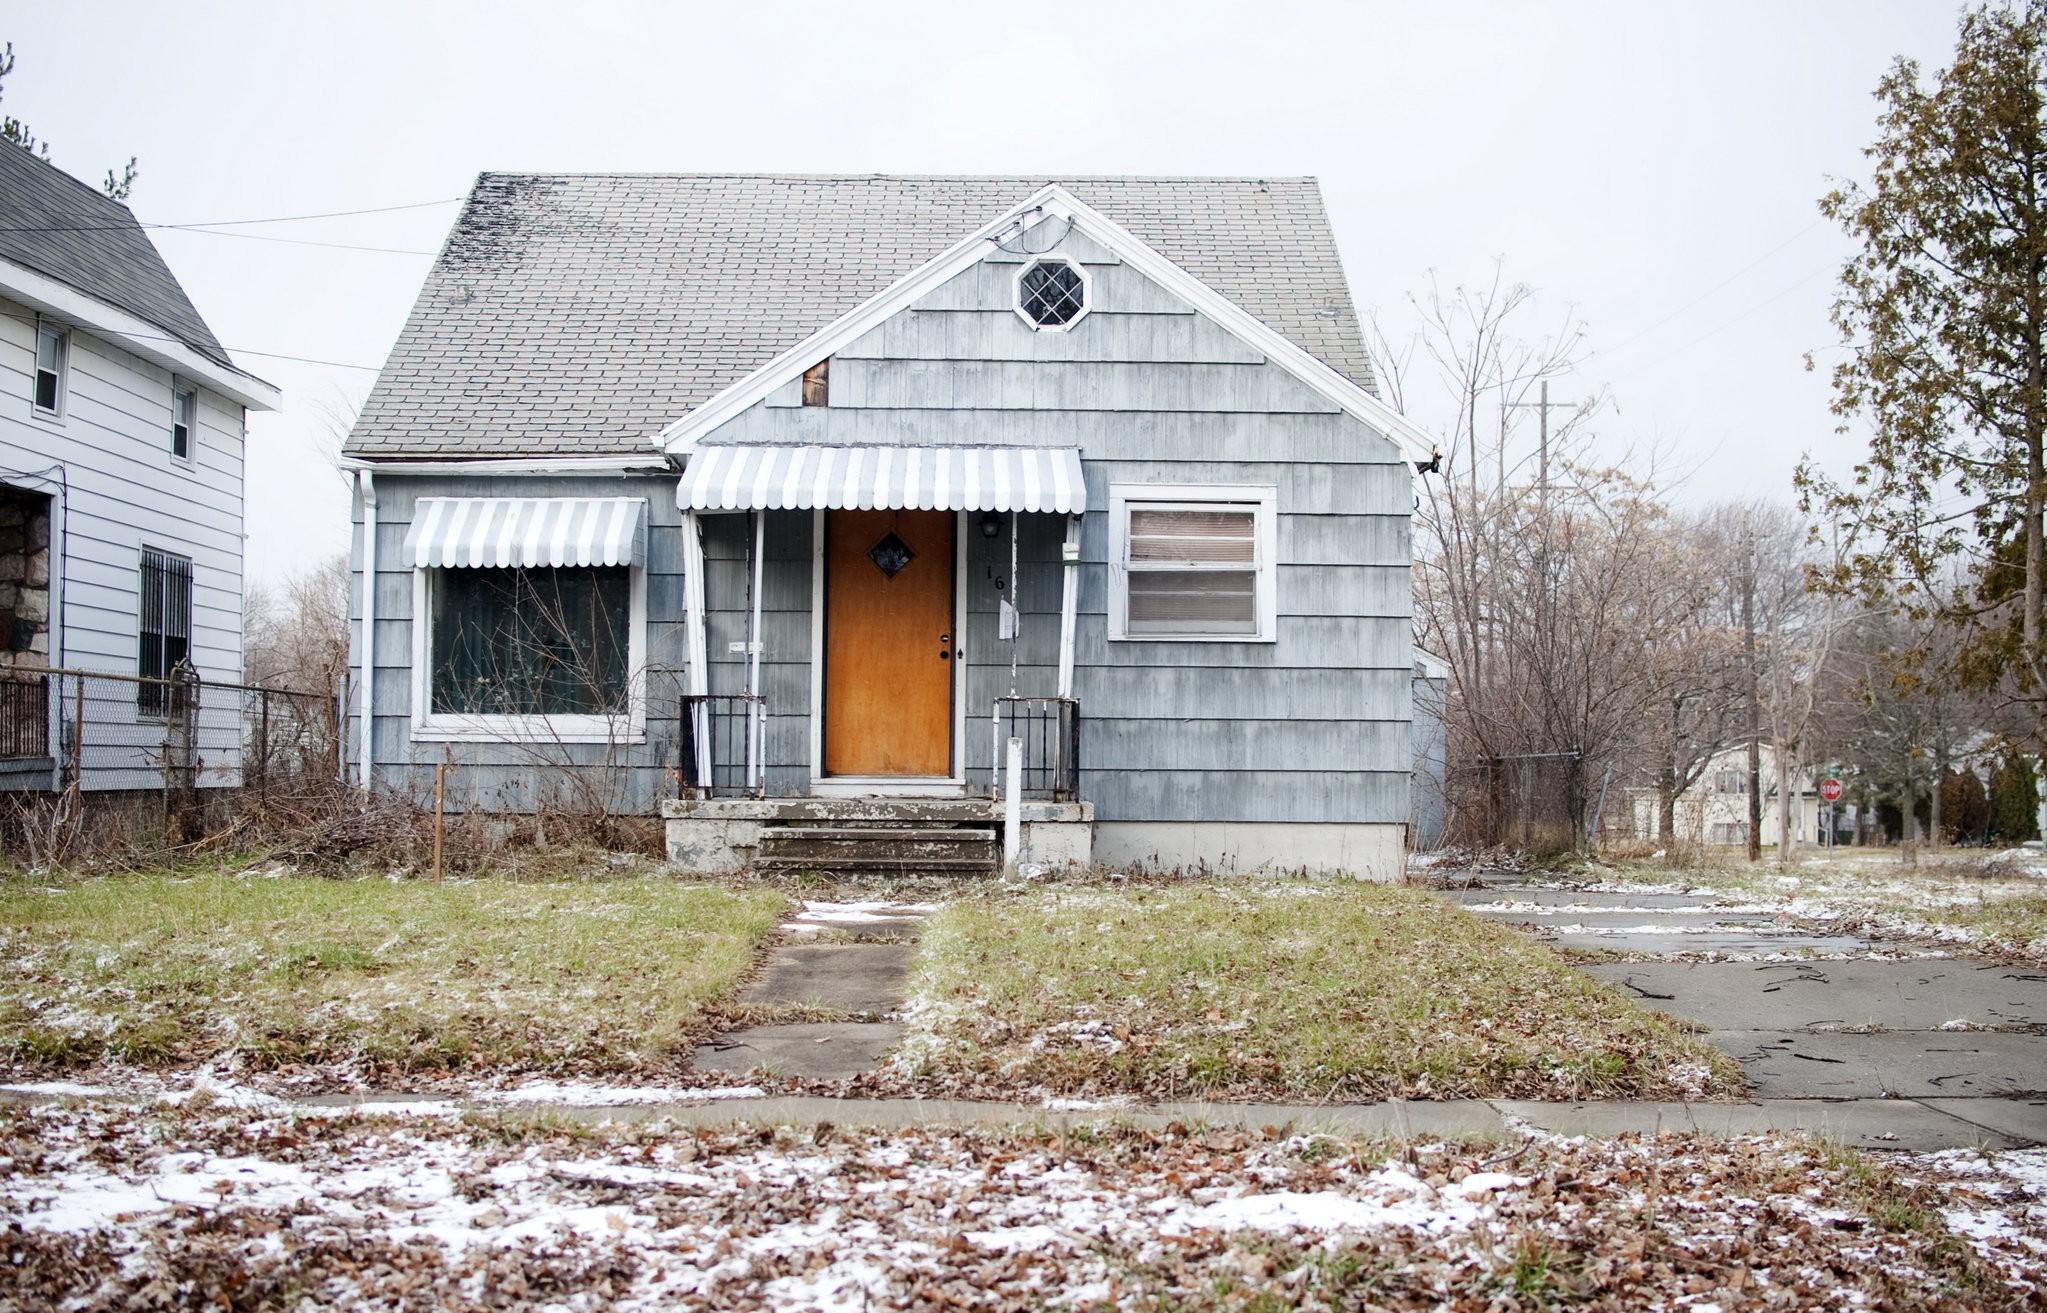 Package Of 58 Flint Houses For Sale On Ebay Mlive Com